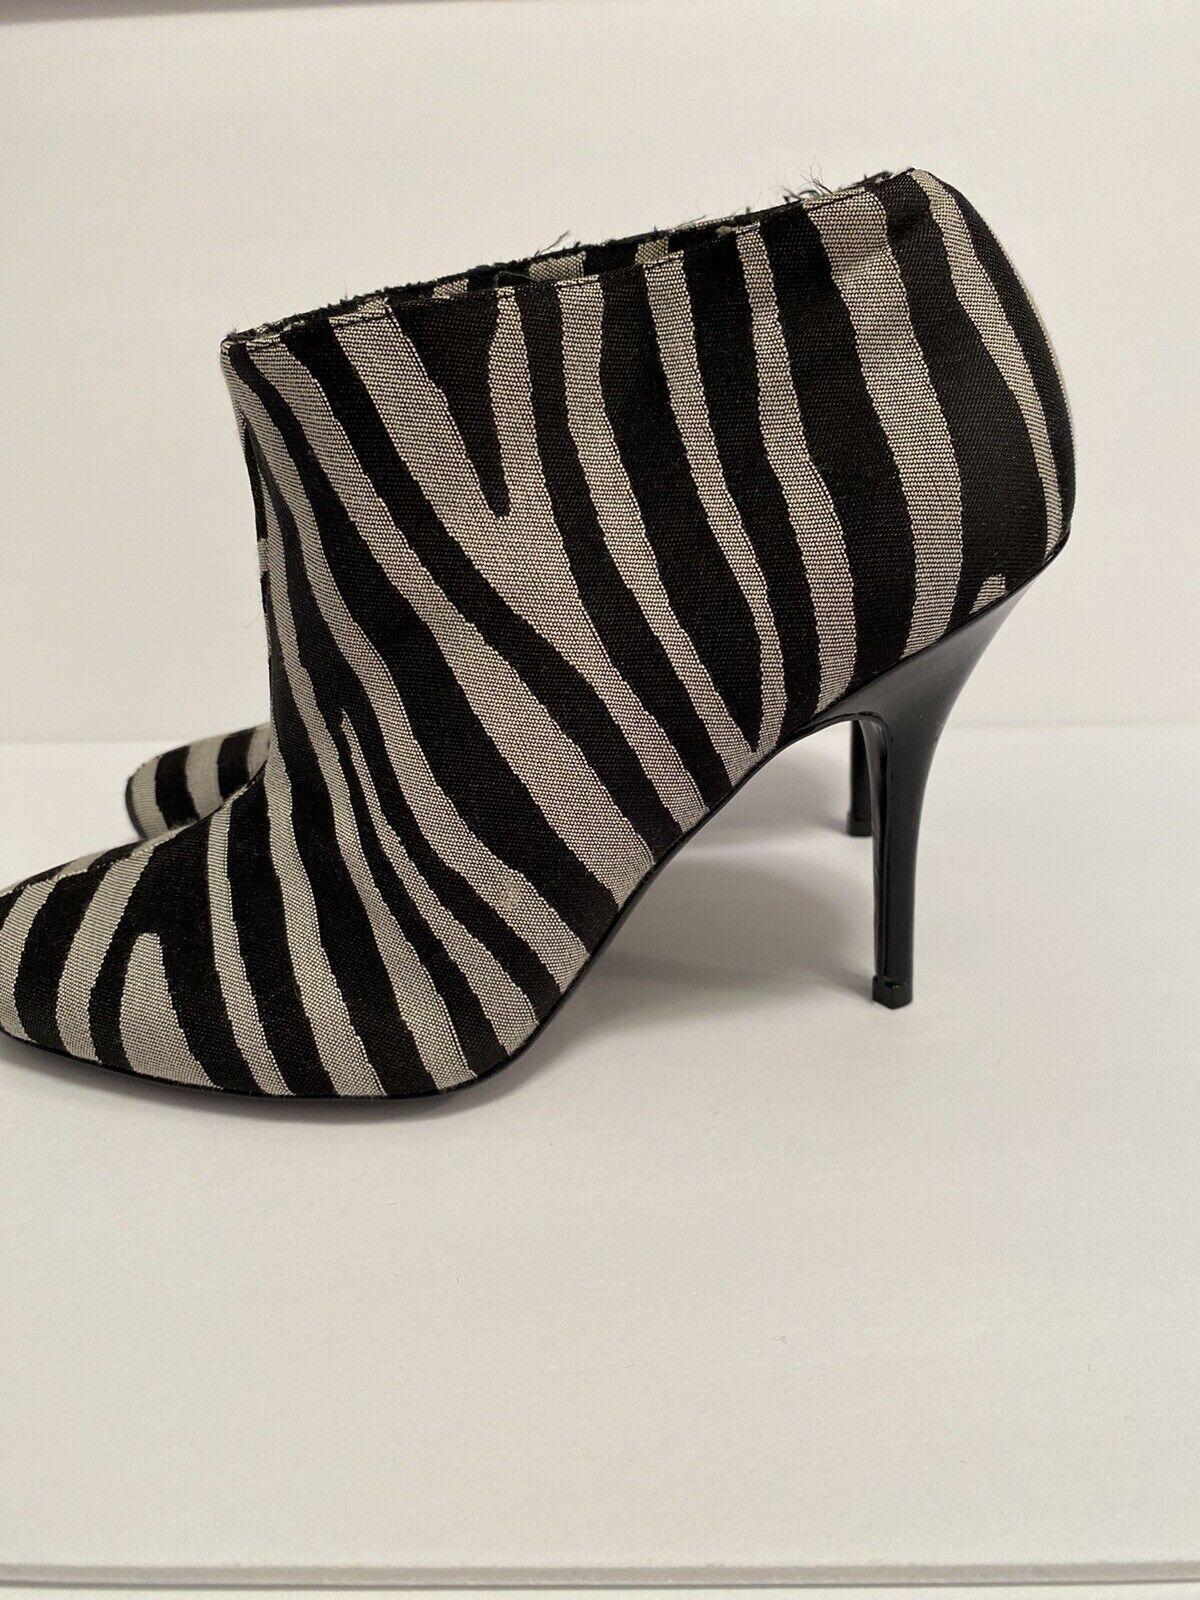 Stella McCartney Zebra Striped Boots Size 36 - image 5